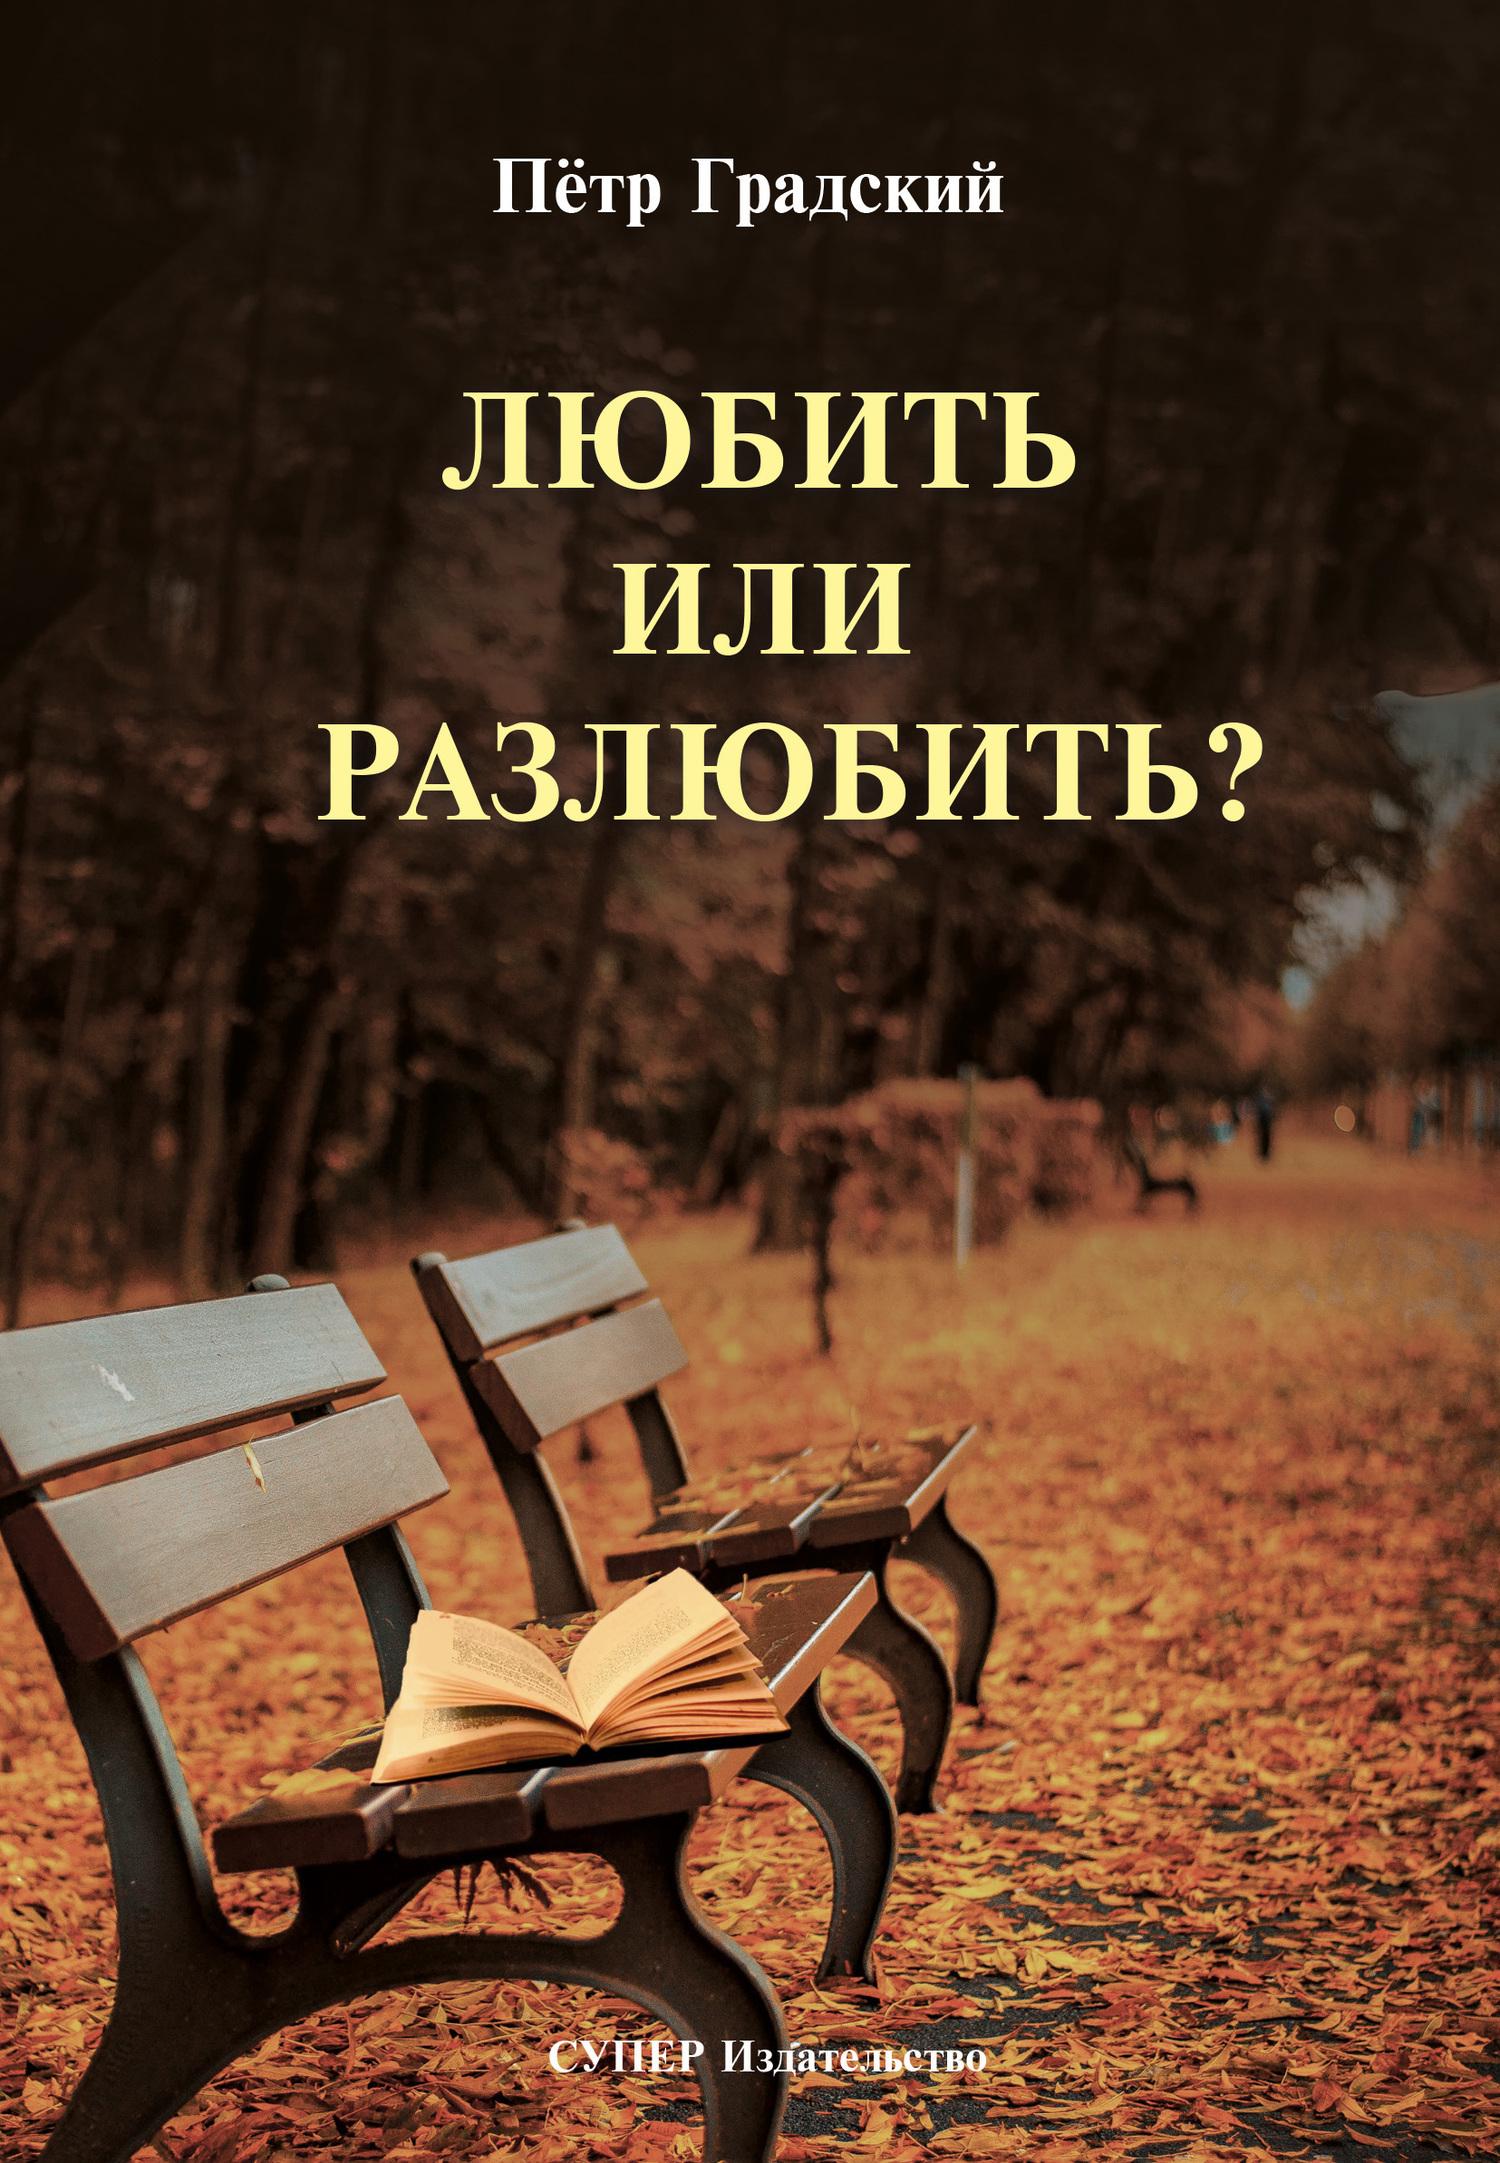 Петр Градский бесплатно